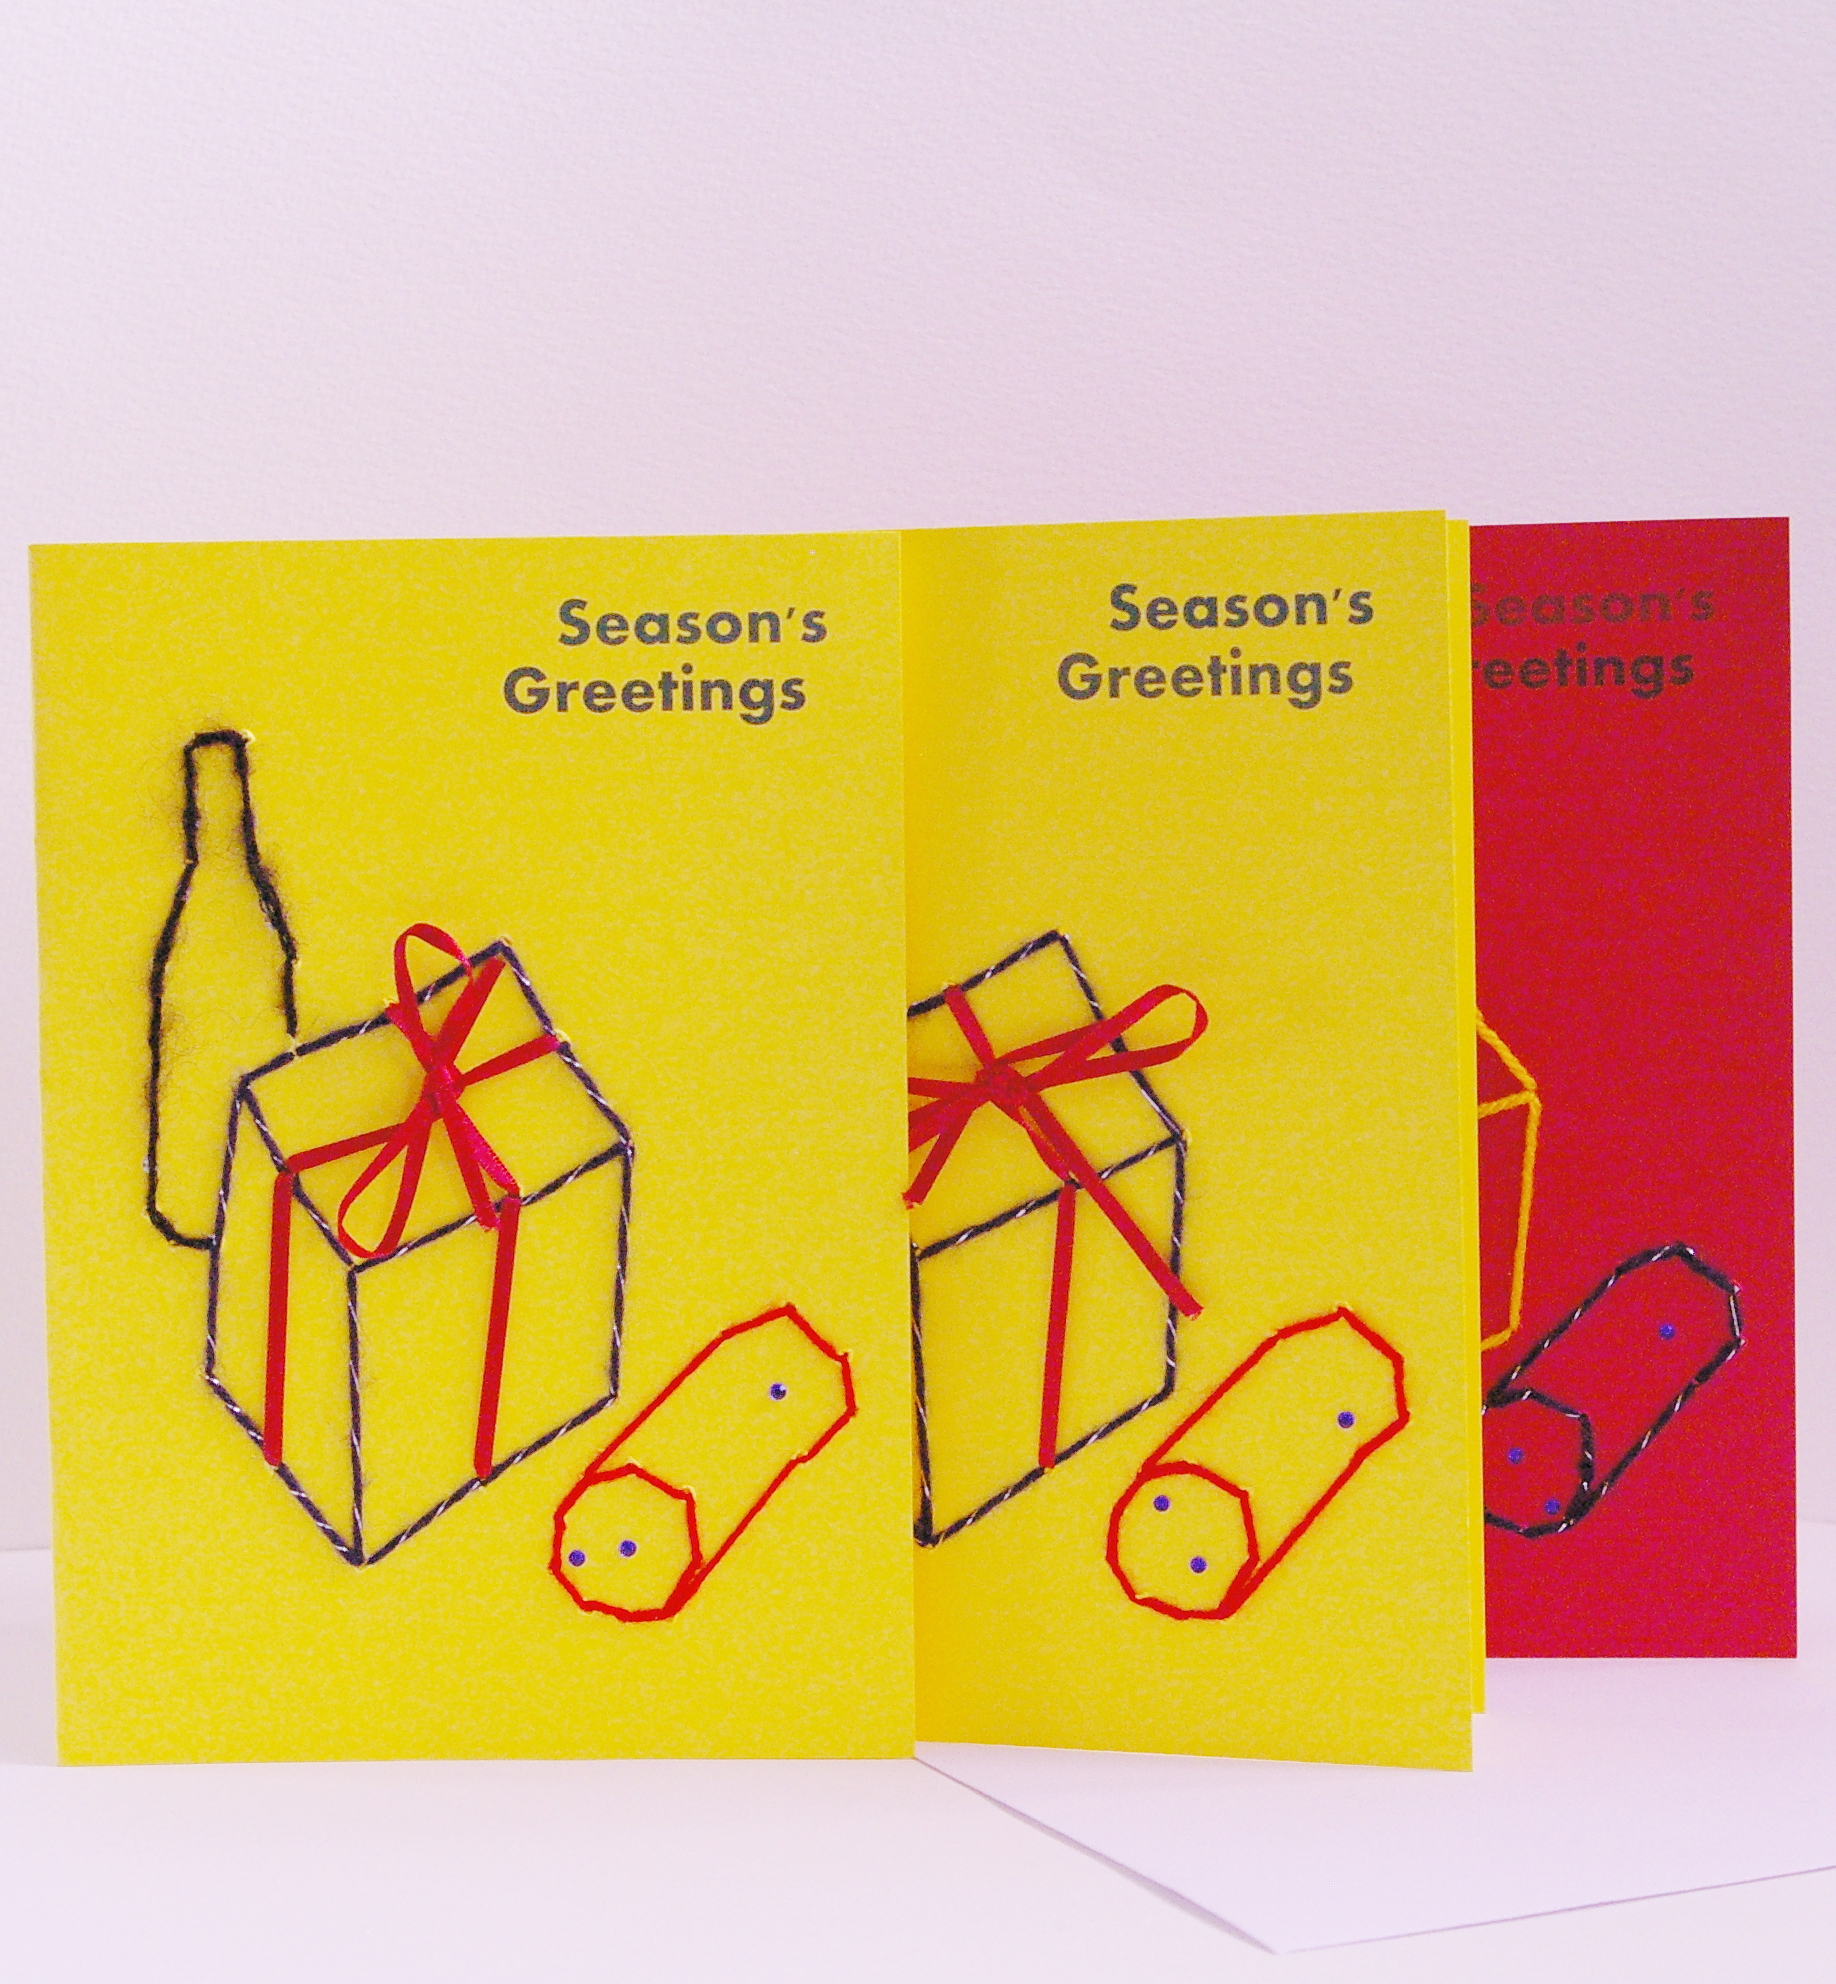 Seasons Greetings Presents Galore Greetings Card Arts Coaching